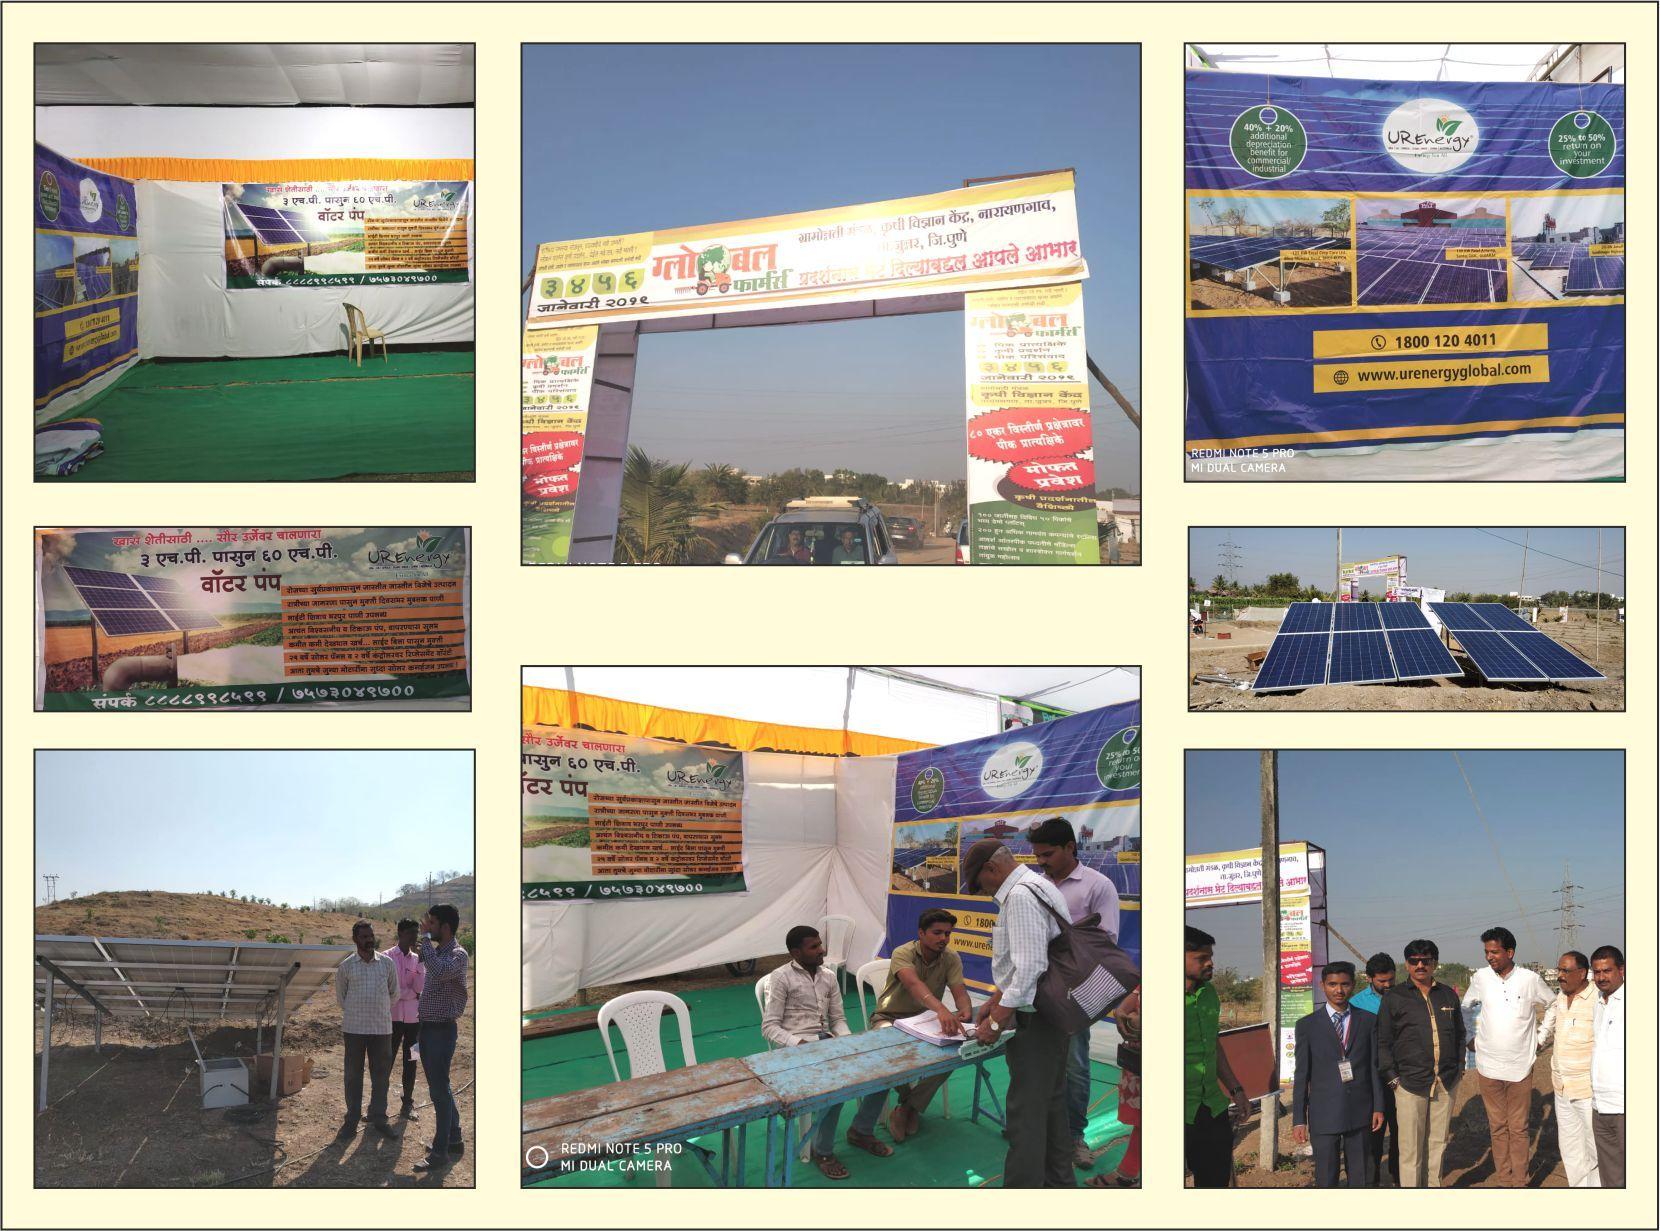 Rooftop Solar Panel Inverters Water Pump Solar Epc Gujarat India U R Energy Solar Solar Water Pump Water Pumps